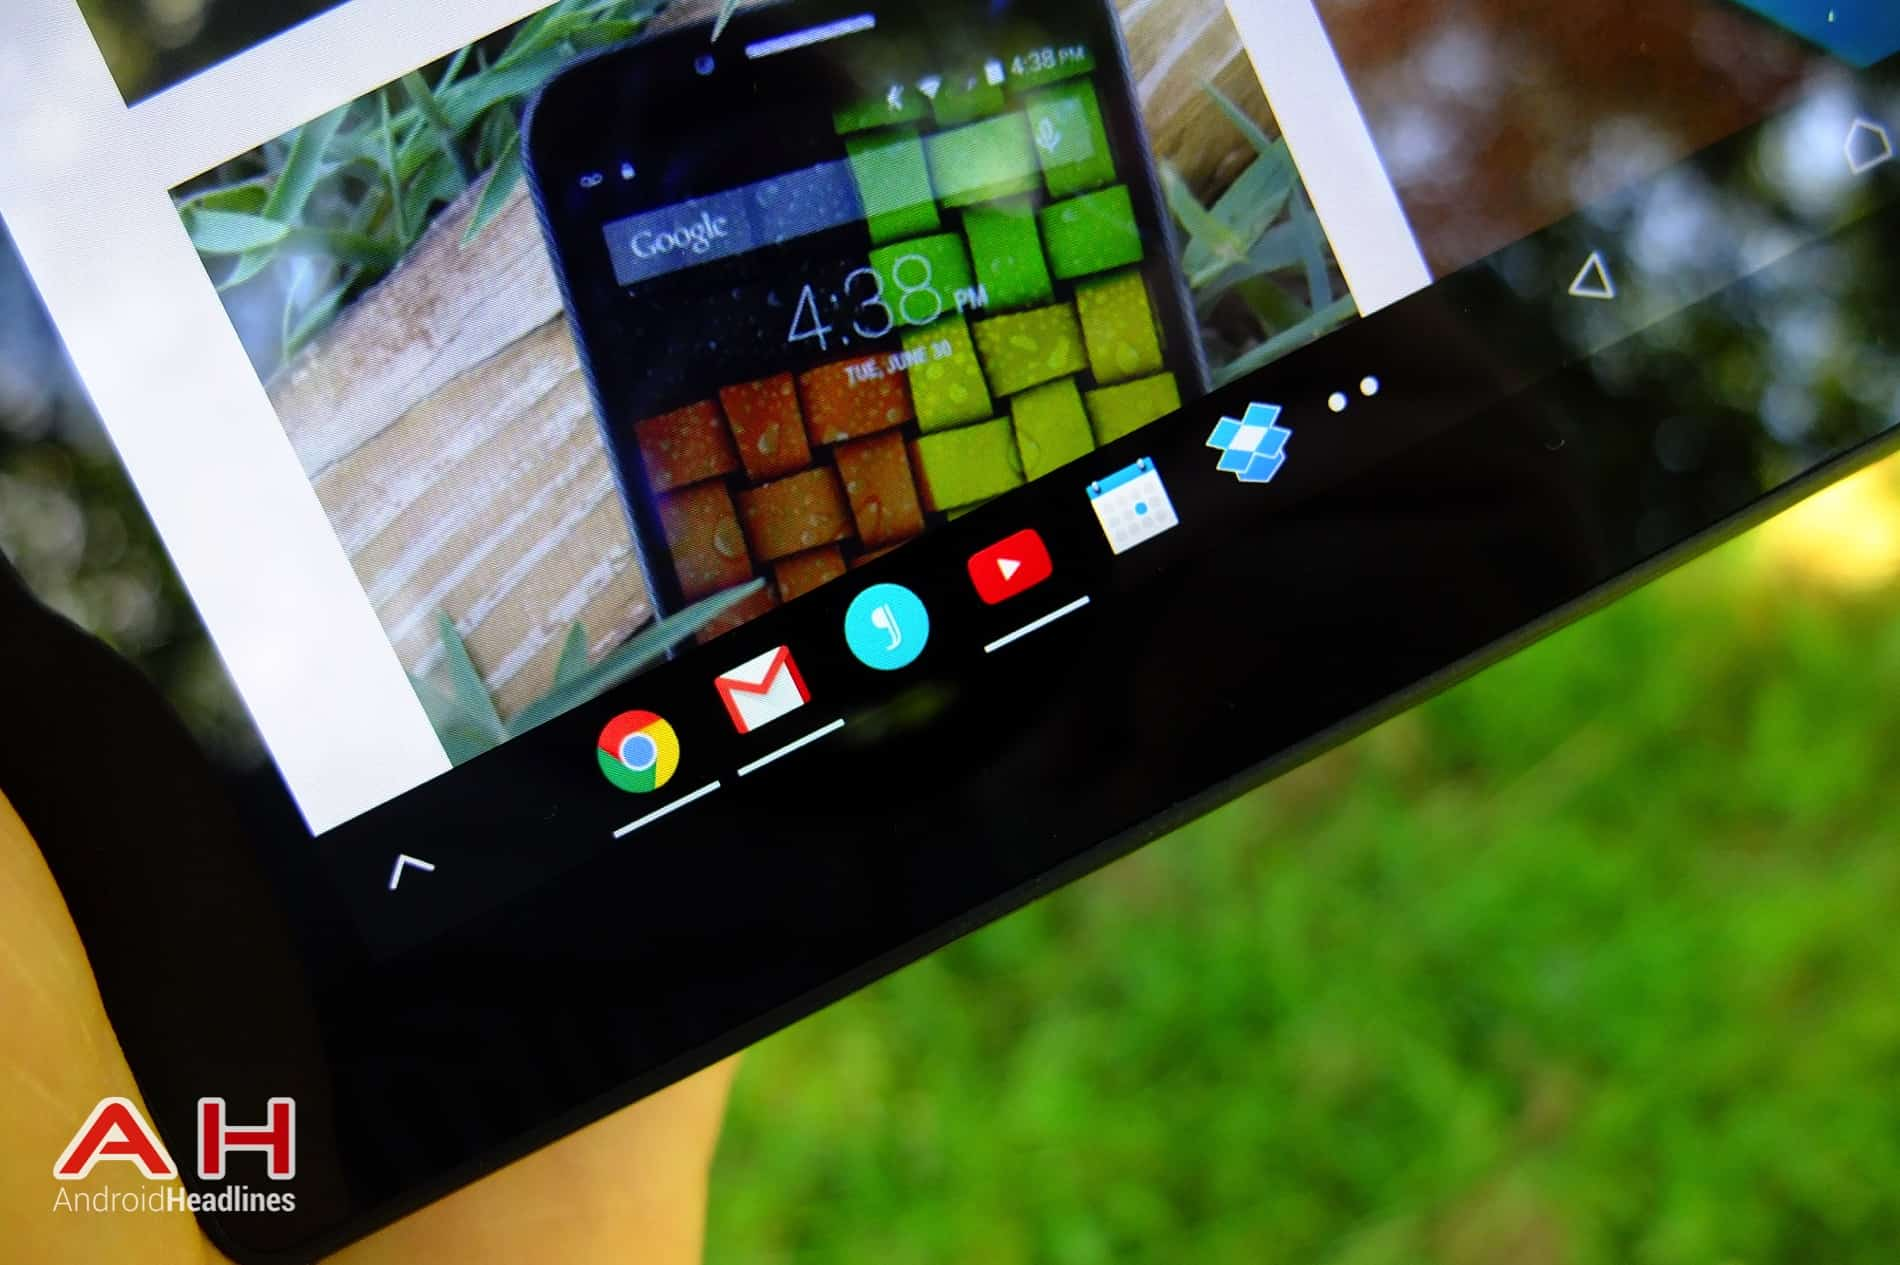 Xperia Z4 Tablet AH 16